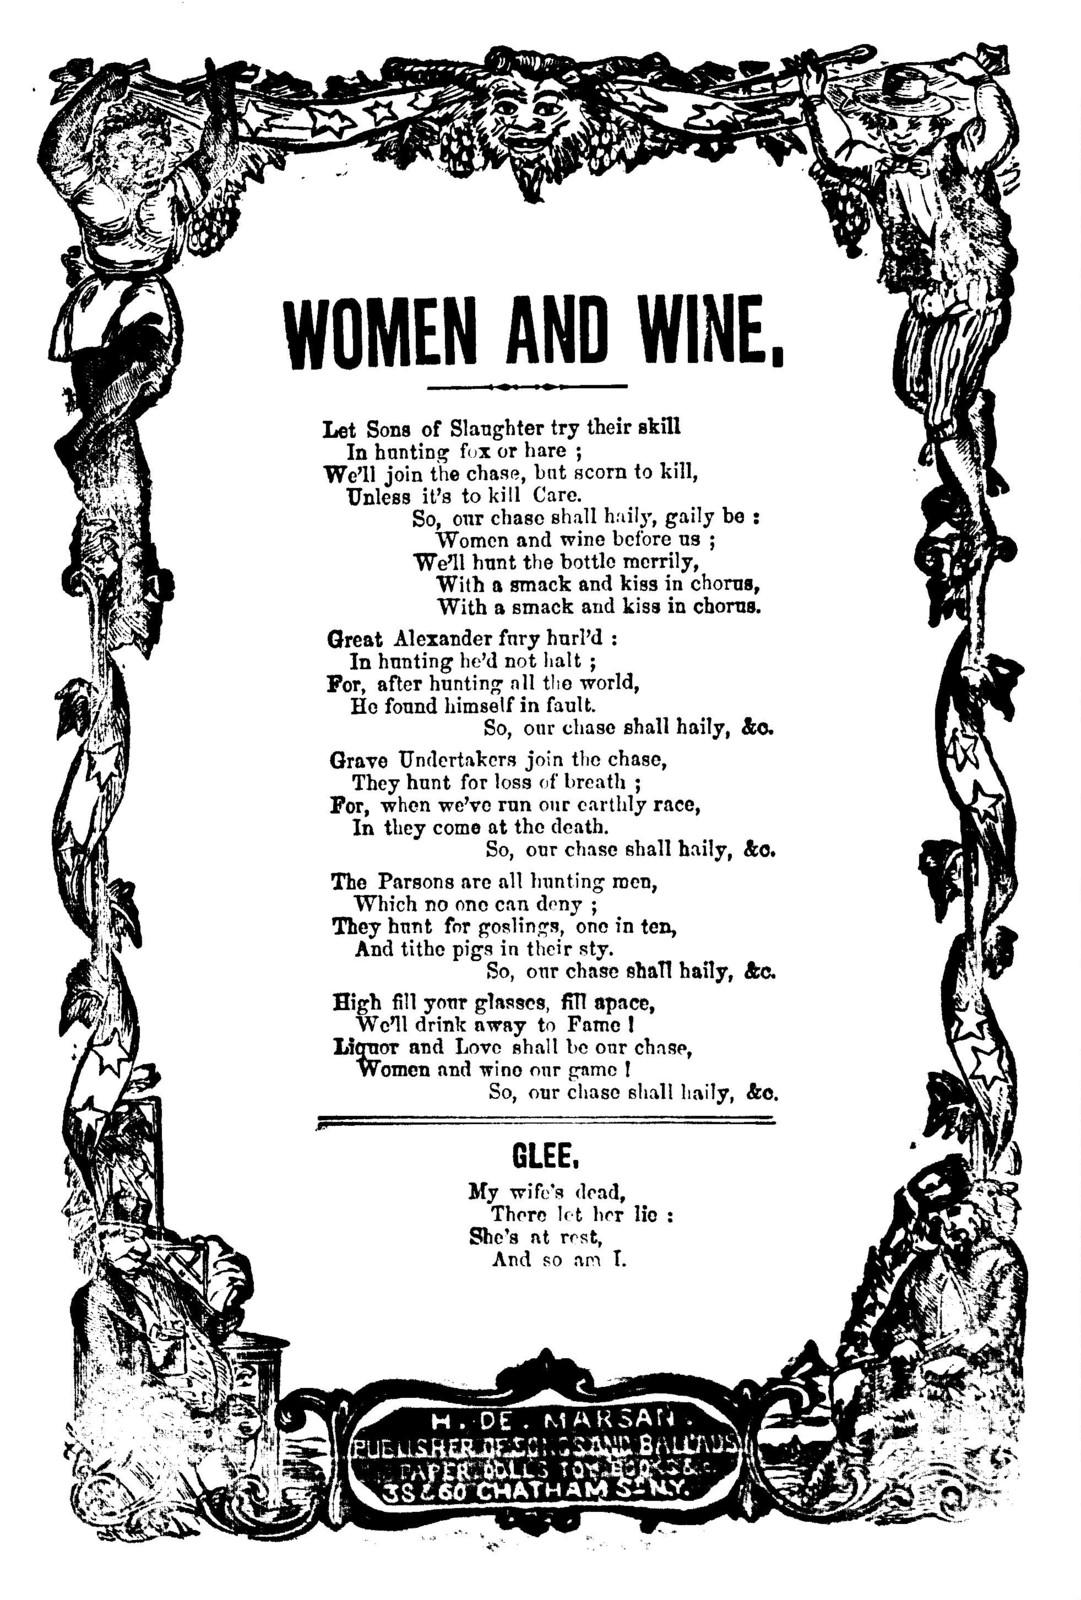 Women and wine. H. De Marsan, Publisher, 38 & 60 Chatham Street, N. Y